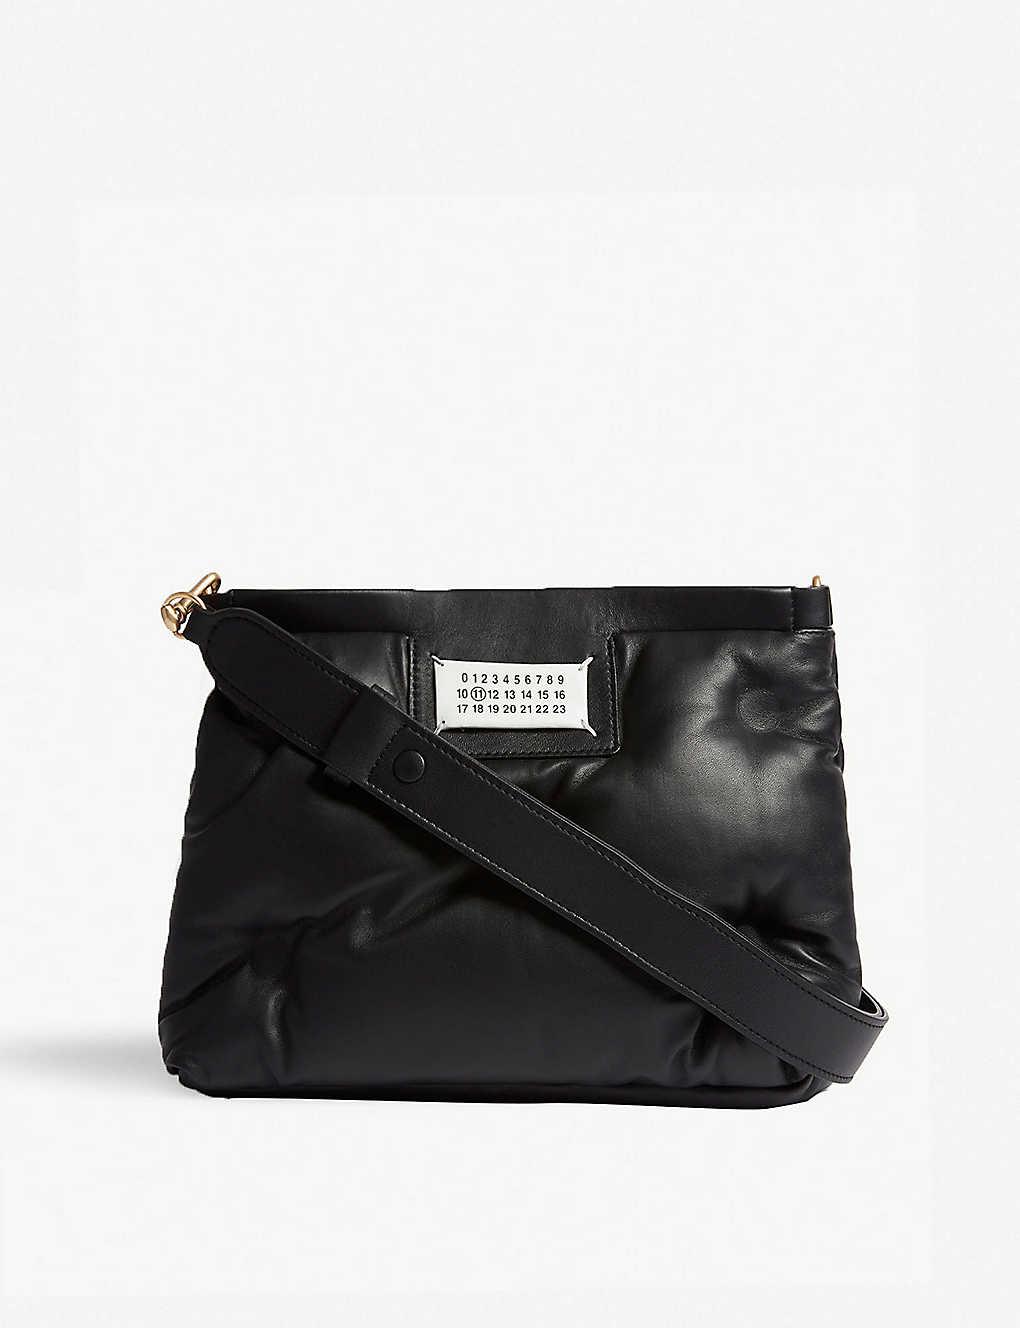 c2d483f2520a MAISON MARGIELA - Glam Slam small leather pillow bag | Selfridges.com